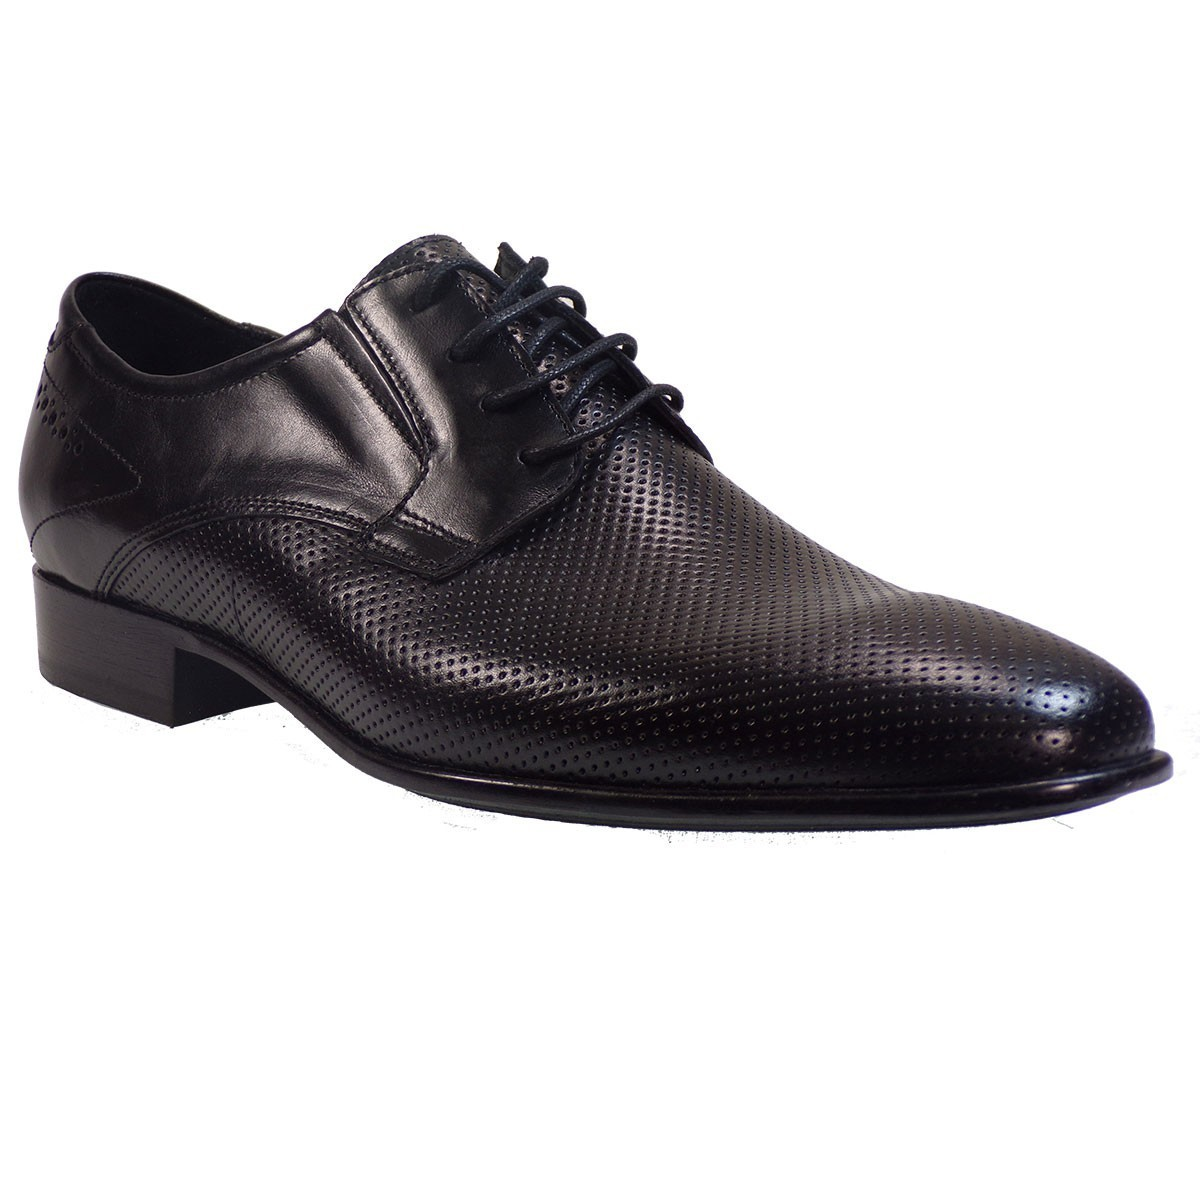 kricket Ανδρικά Παπούτσια 681Λ Μαύρο Δέρμα